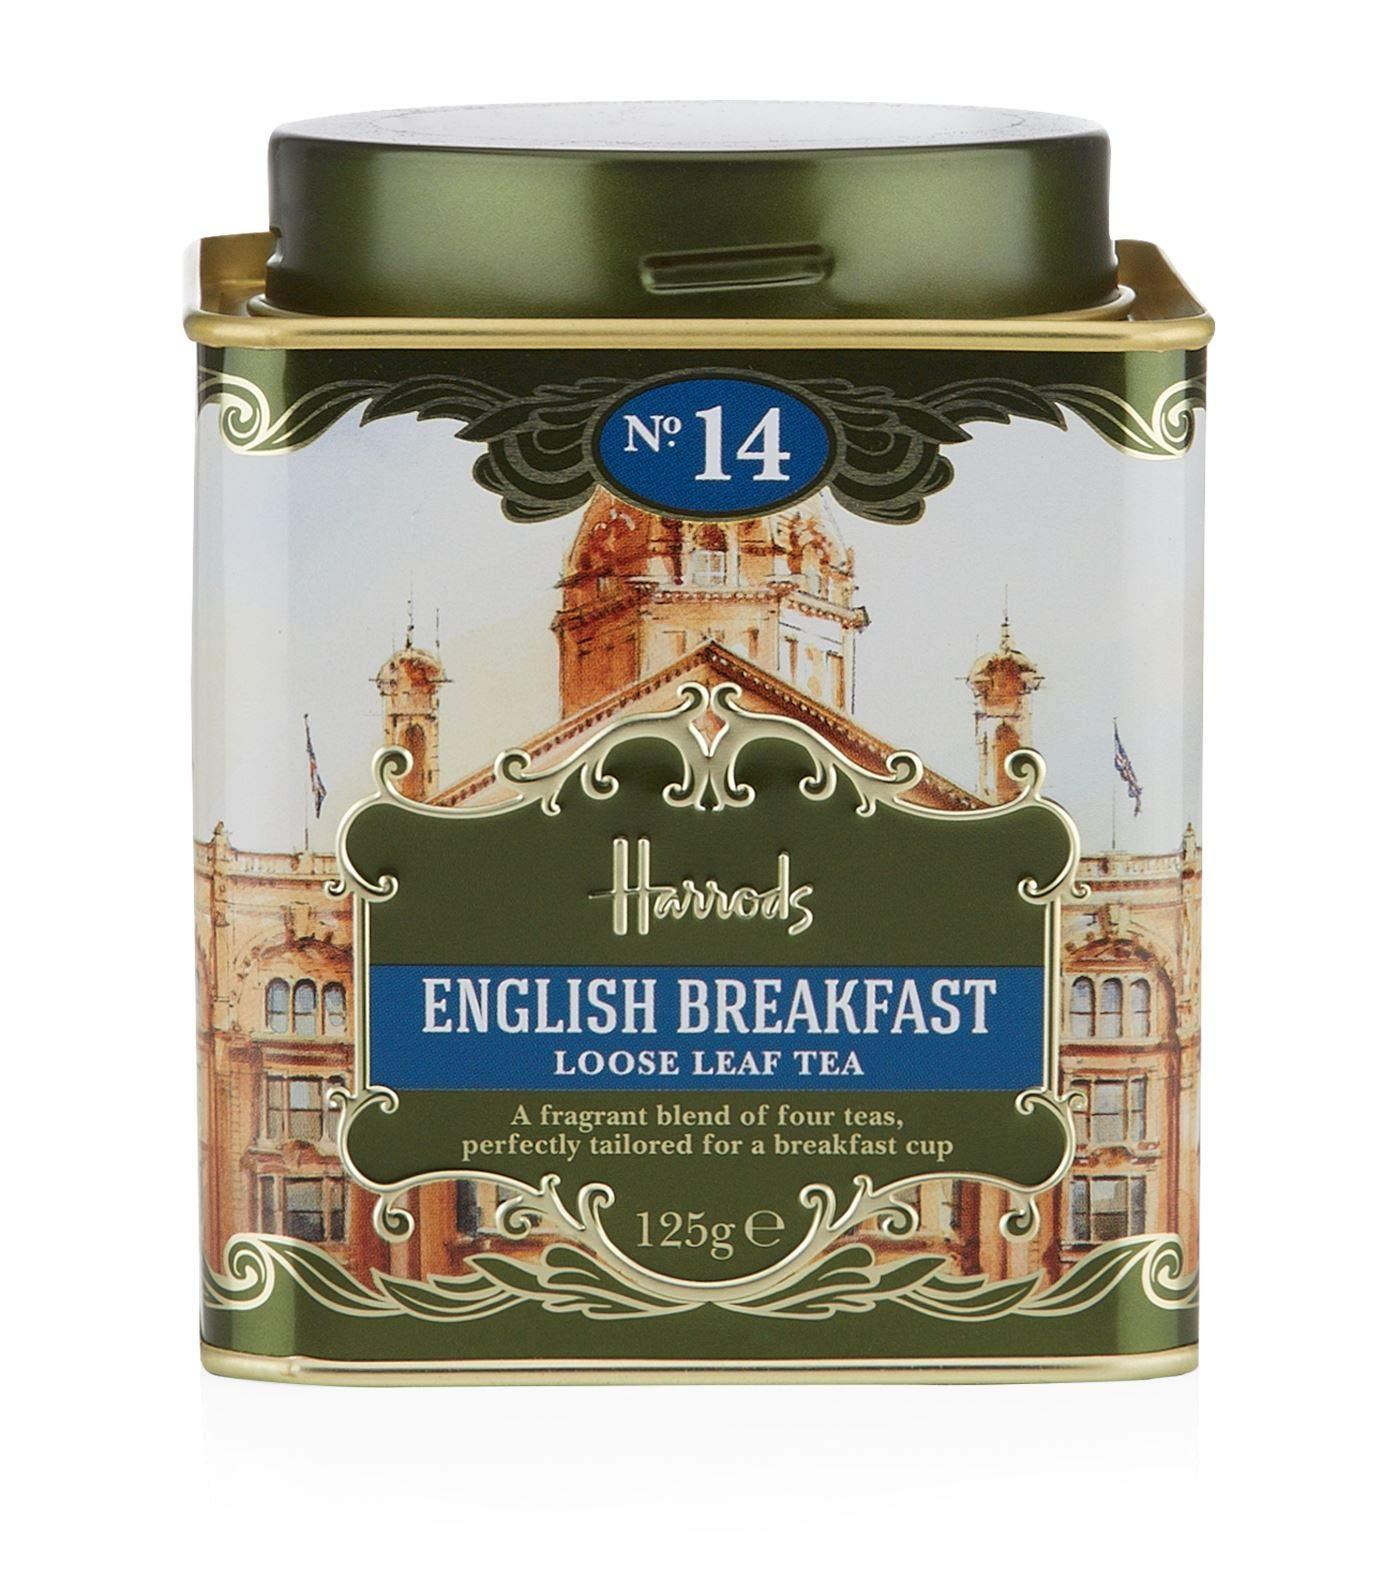 Harrods London. No. 14, English Breakfast 125g Loose Tea 4.4oz GIFT TIN CADDY - USA Stock